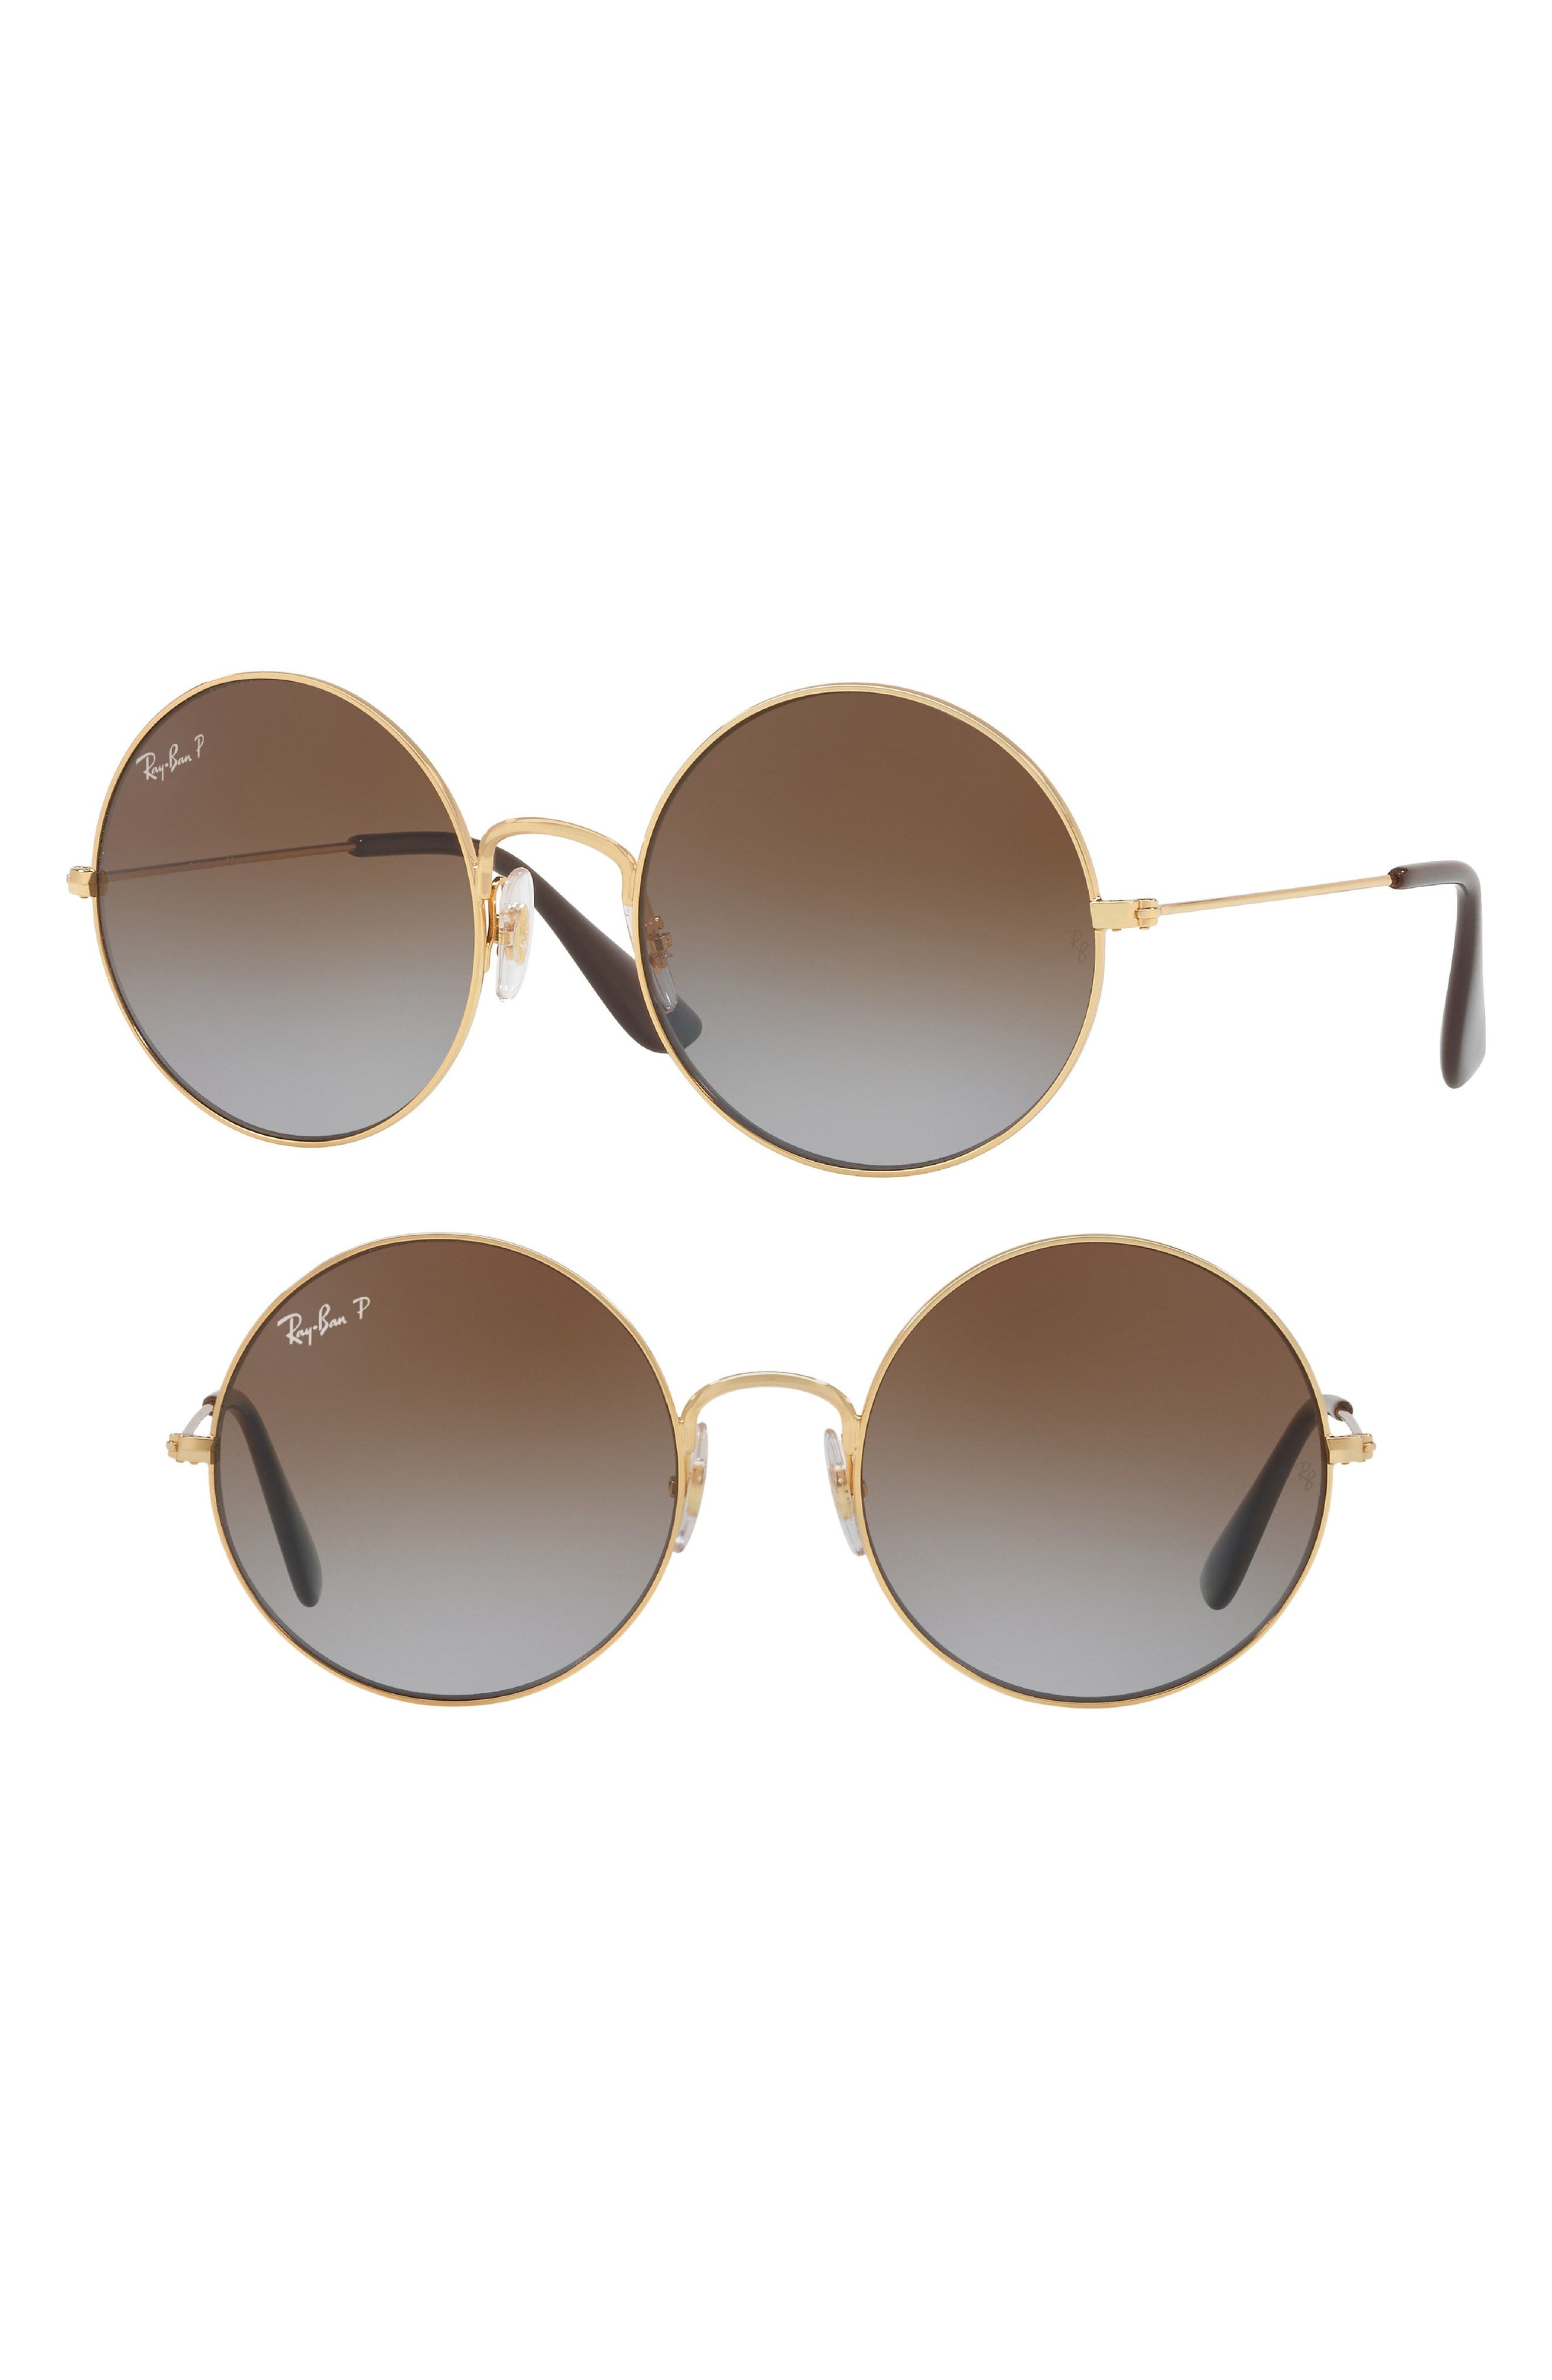 Ja-Jo 50mm Round Polarized Sunglasses,                         Main,                         color, 710